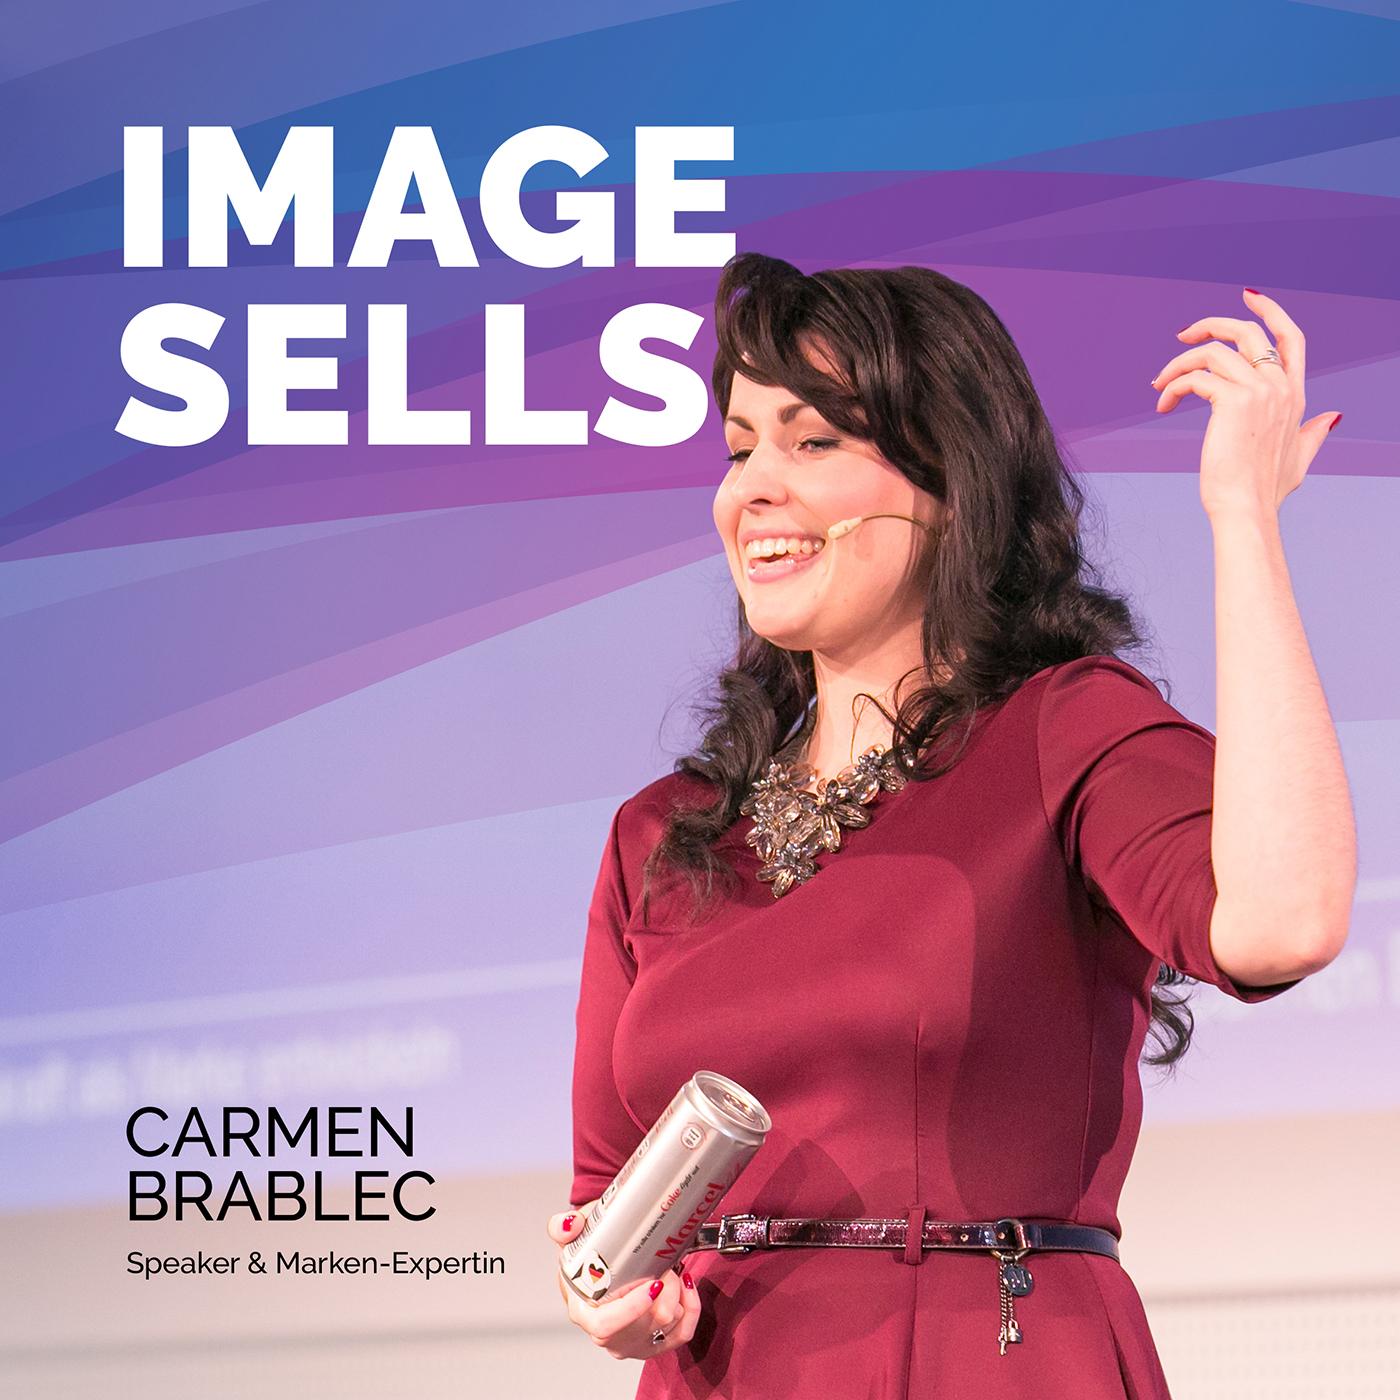 Image Sells - So verkaufen Marken